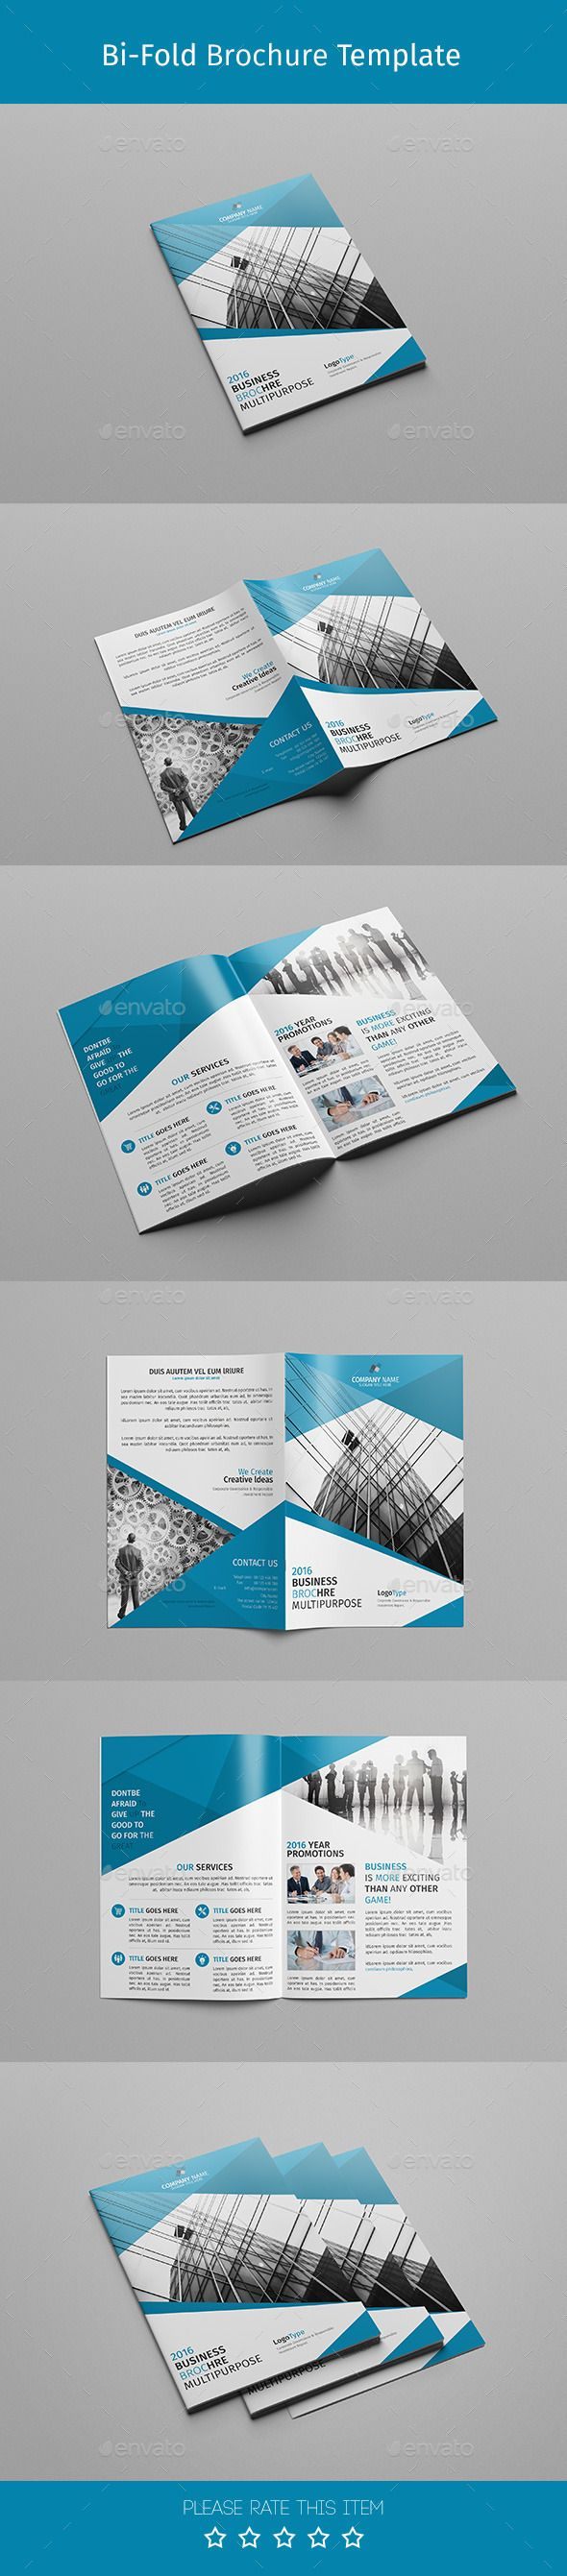 Multipurpose Corporate Bi-fold Brochure Template PSD #design Download: http://graphicriver.net/item/corporate-bifold-brochuremultipurpose-02/14140046?ref=ksioks